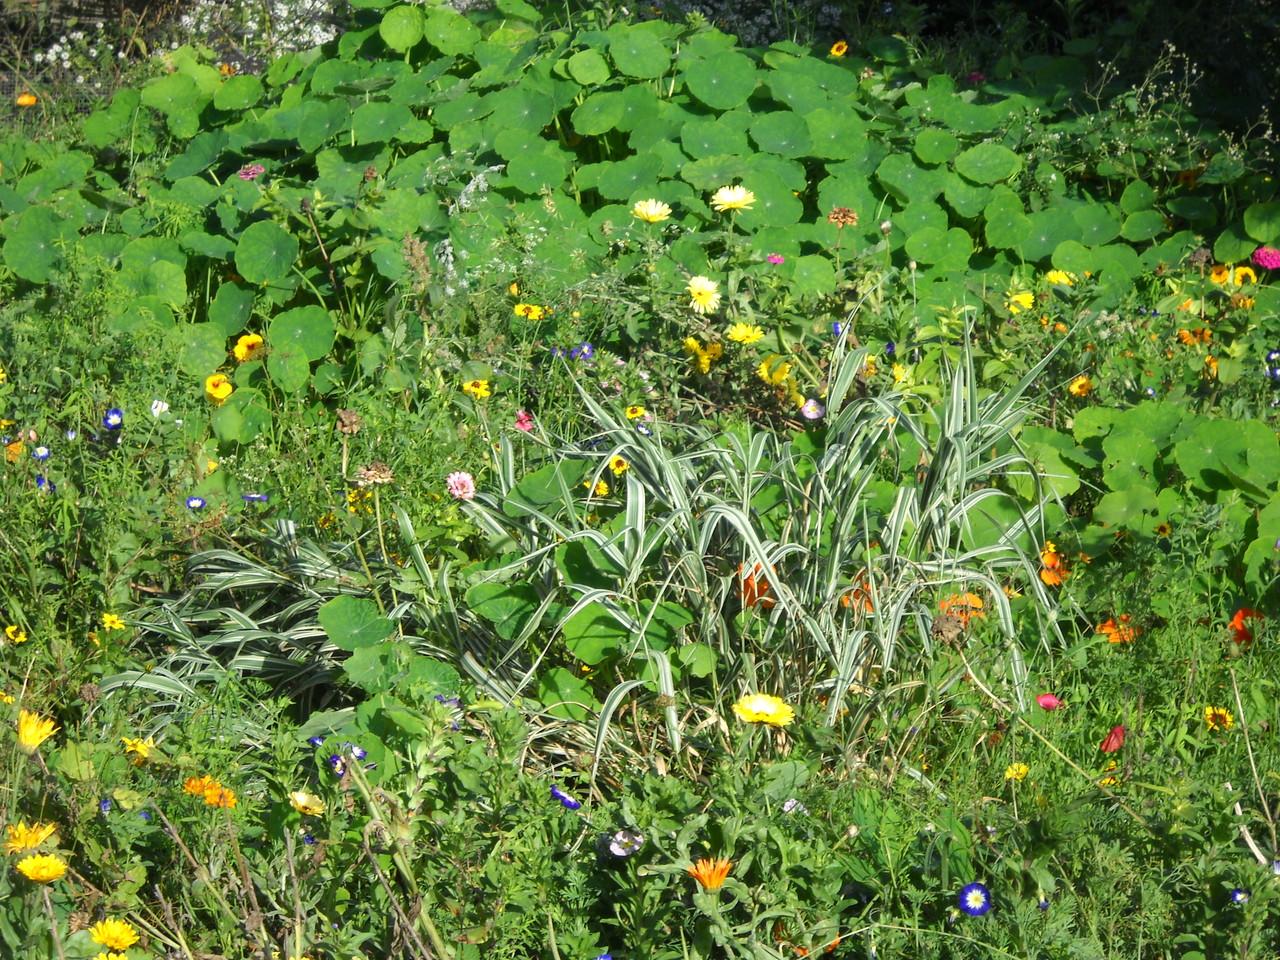 prairie fleurie gite ecologique Aisne